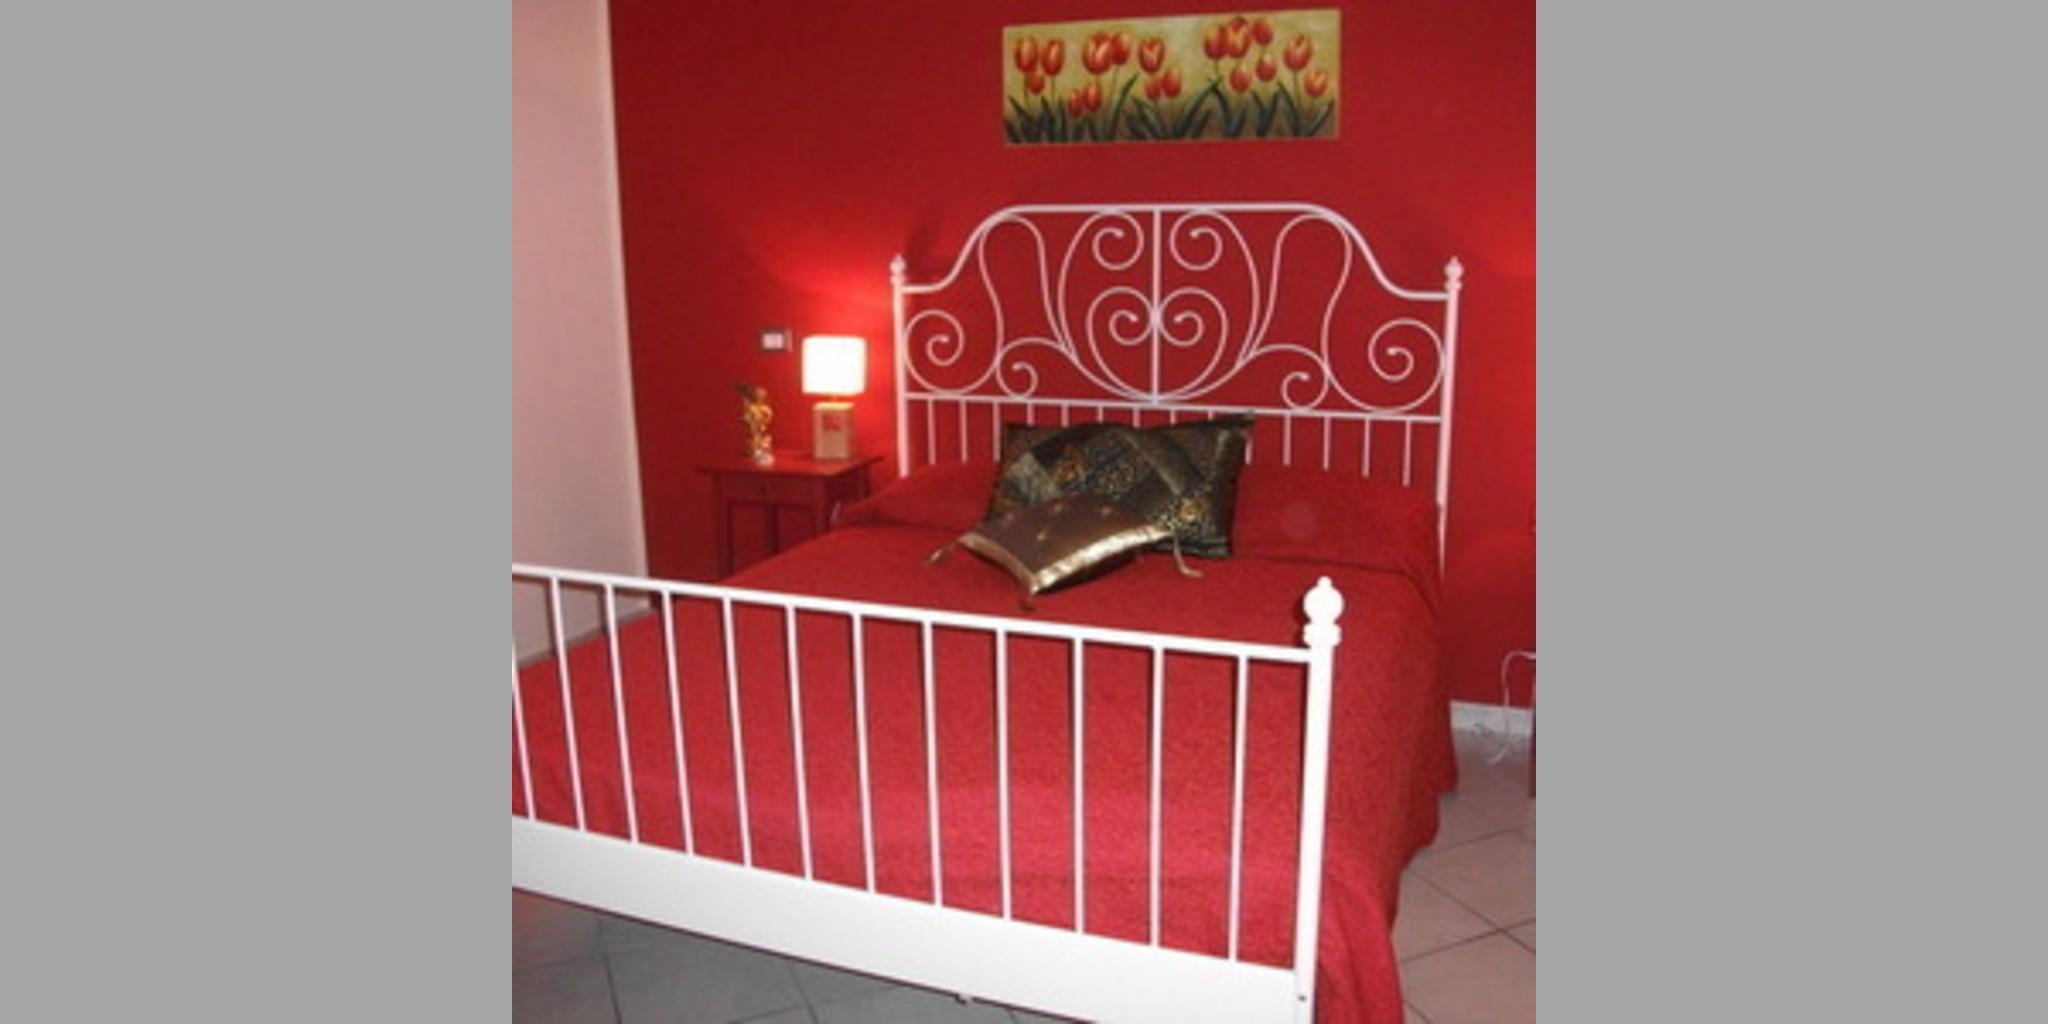 Bed & Breakfast Sant'Alessio Siculo - Sant'alessio Siculo